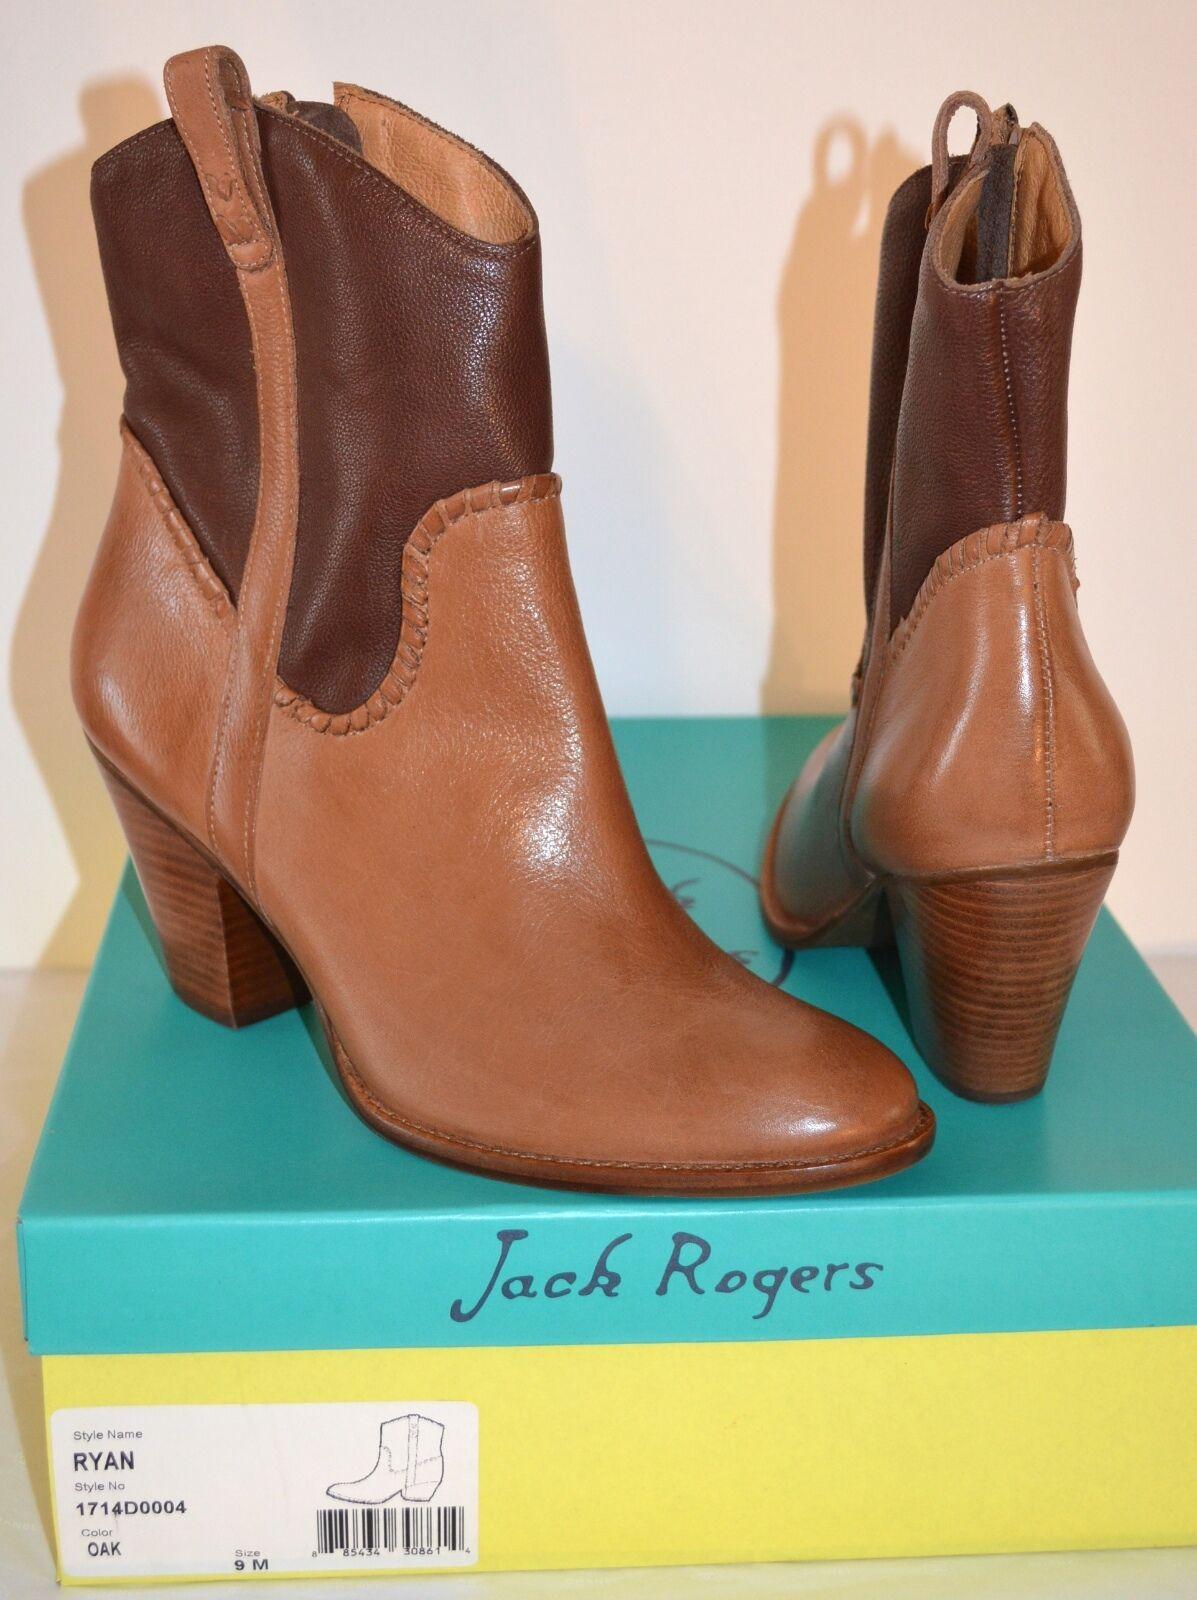 New  228 Jack Rogers Ryan Oak Short Brown Leather Short Oak Cowboy Boot f075c7